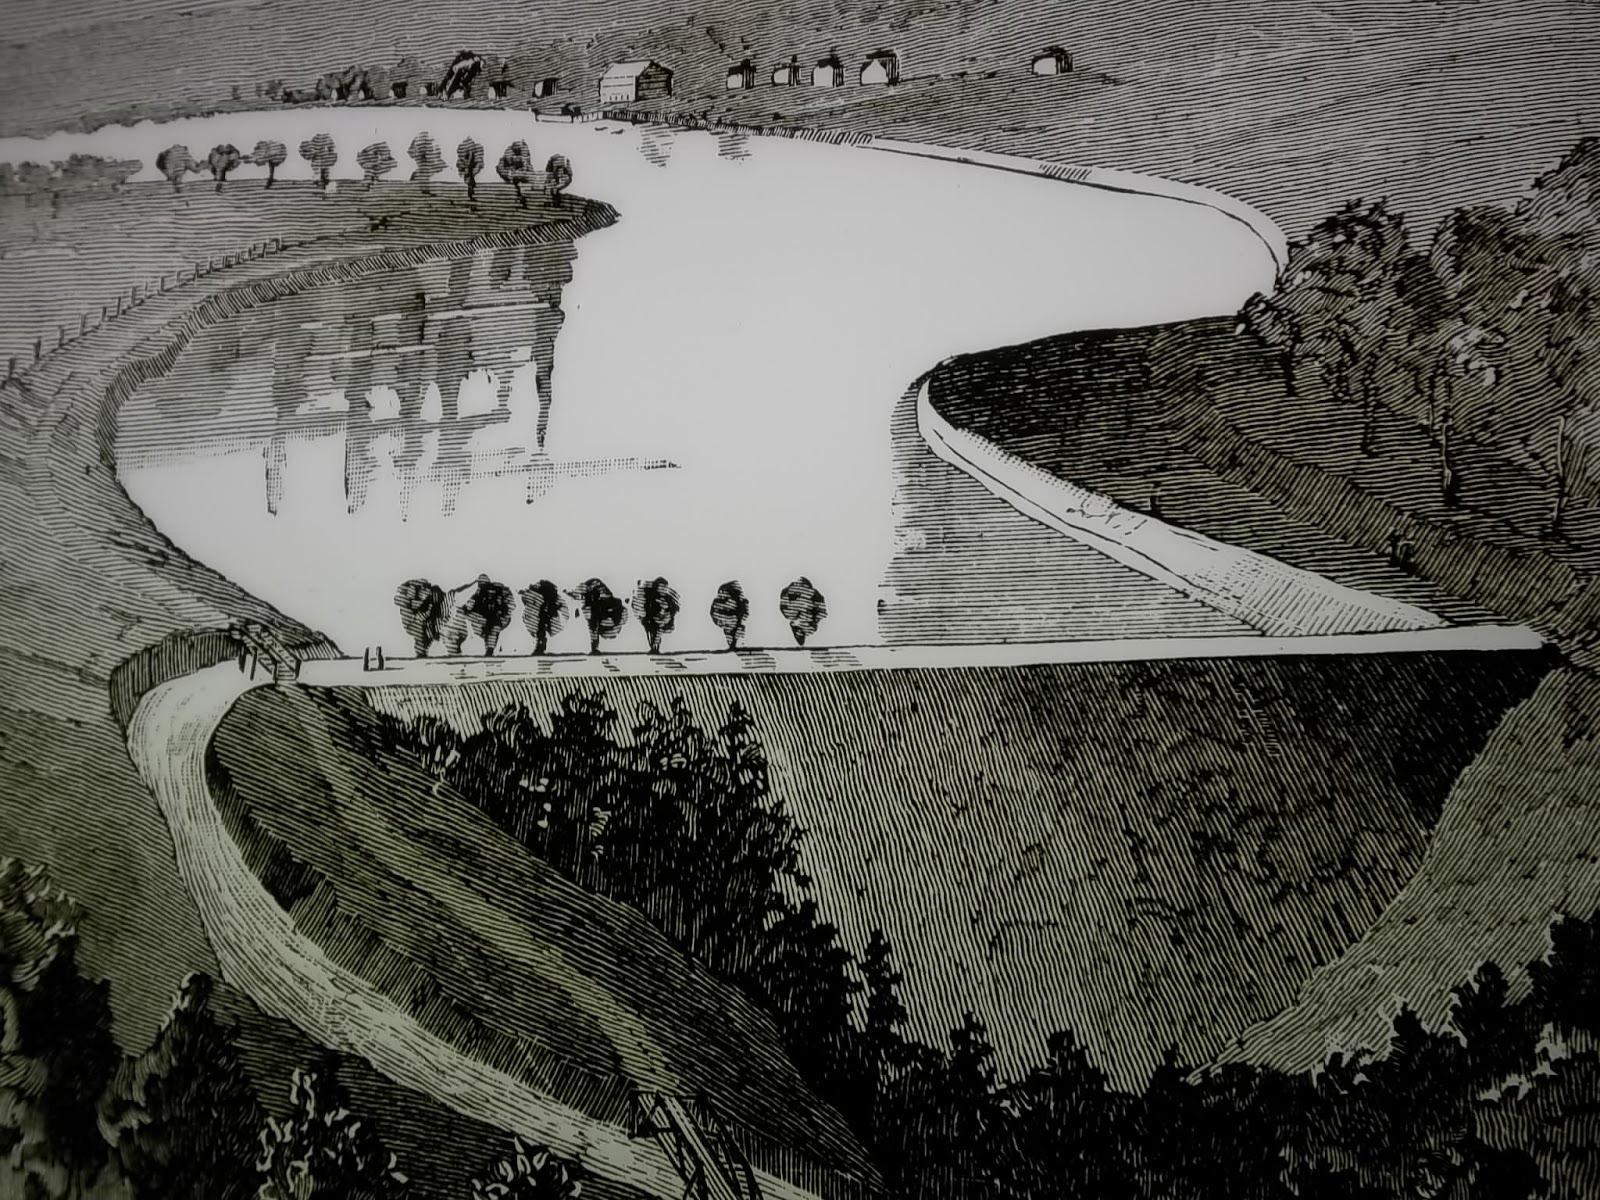 johnstown flood david mccullough thesis